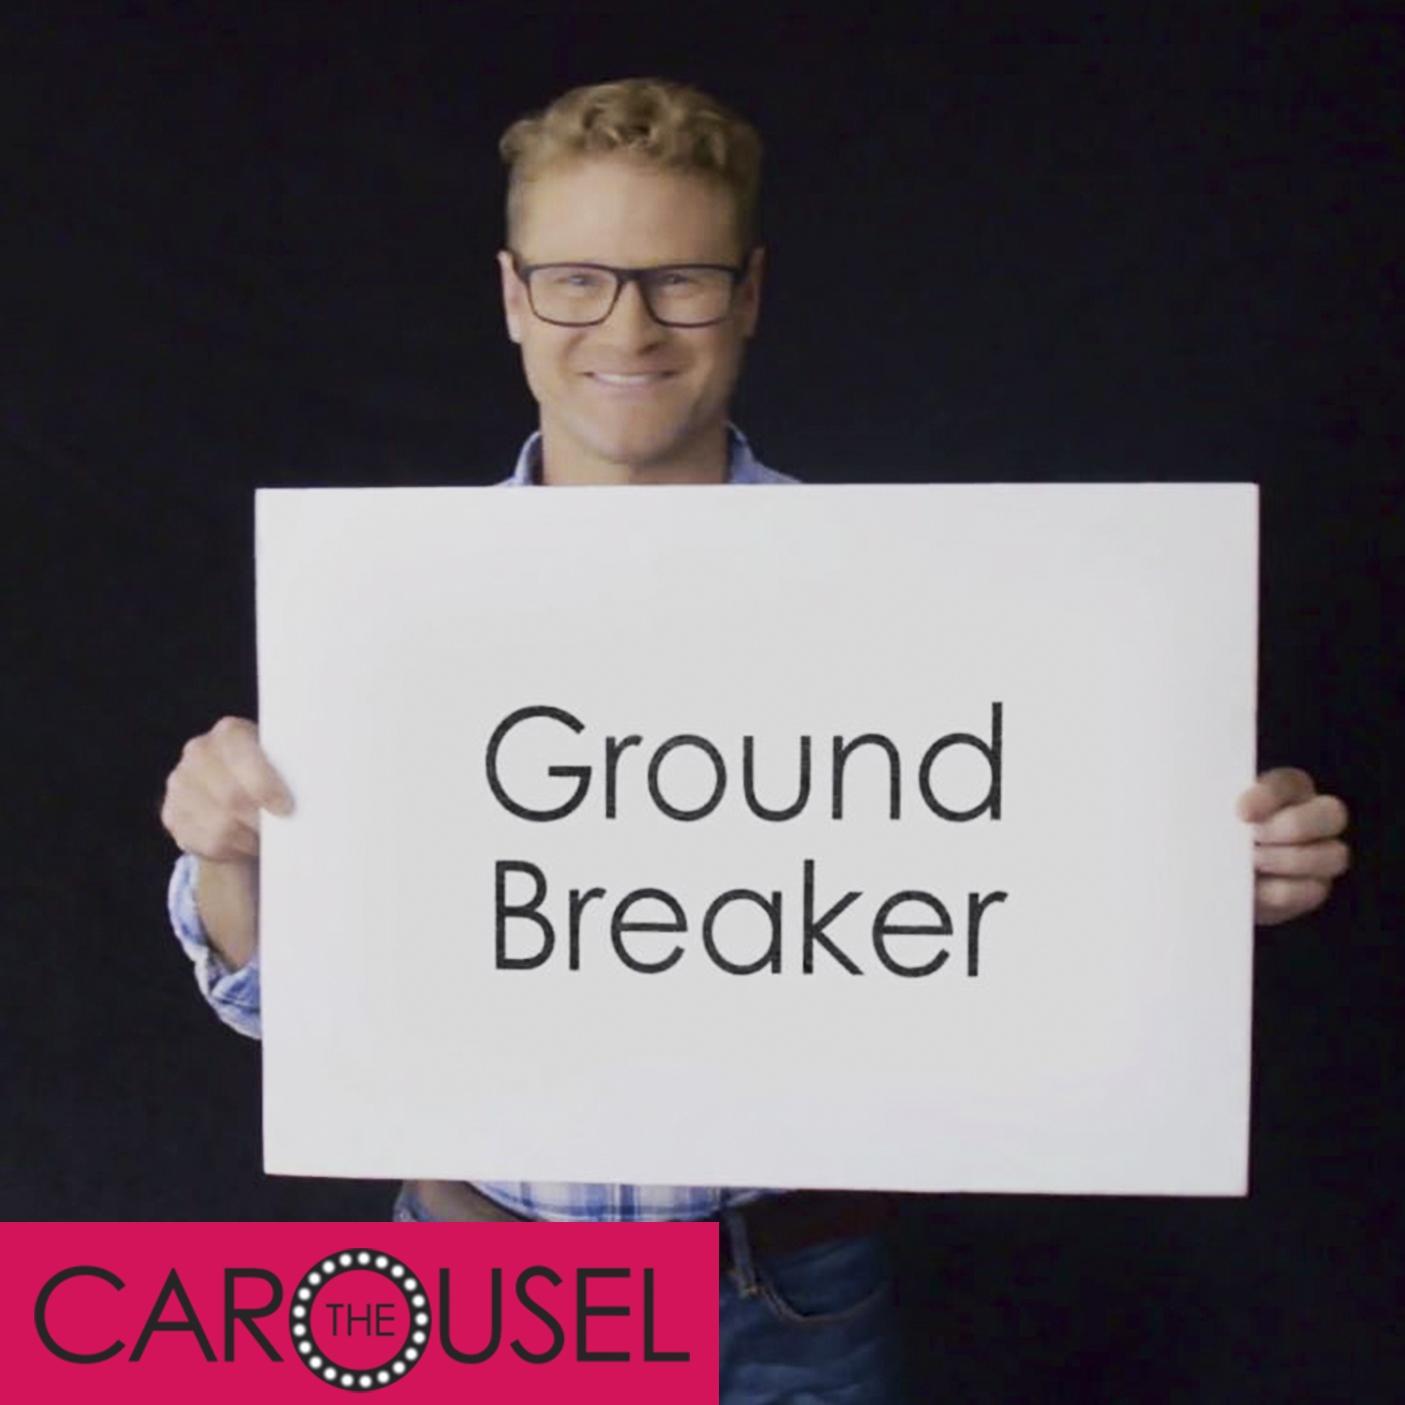 game changer - tech entrepreneur scott pendlebury on building e-commerce platform renovator store